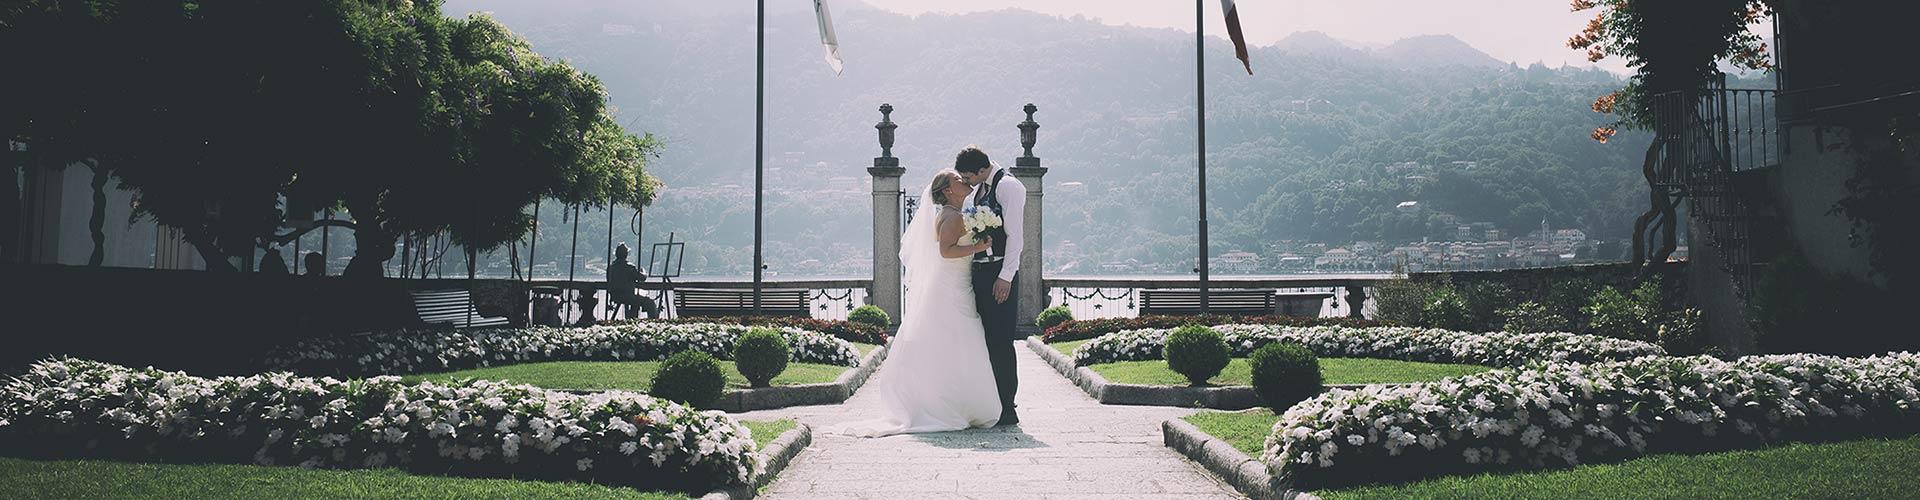 fotografa-matrimonio-omegna-lago-orta